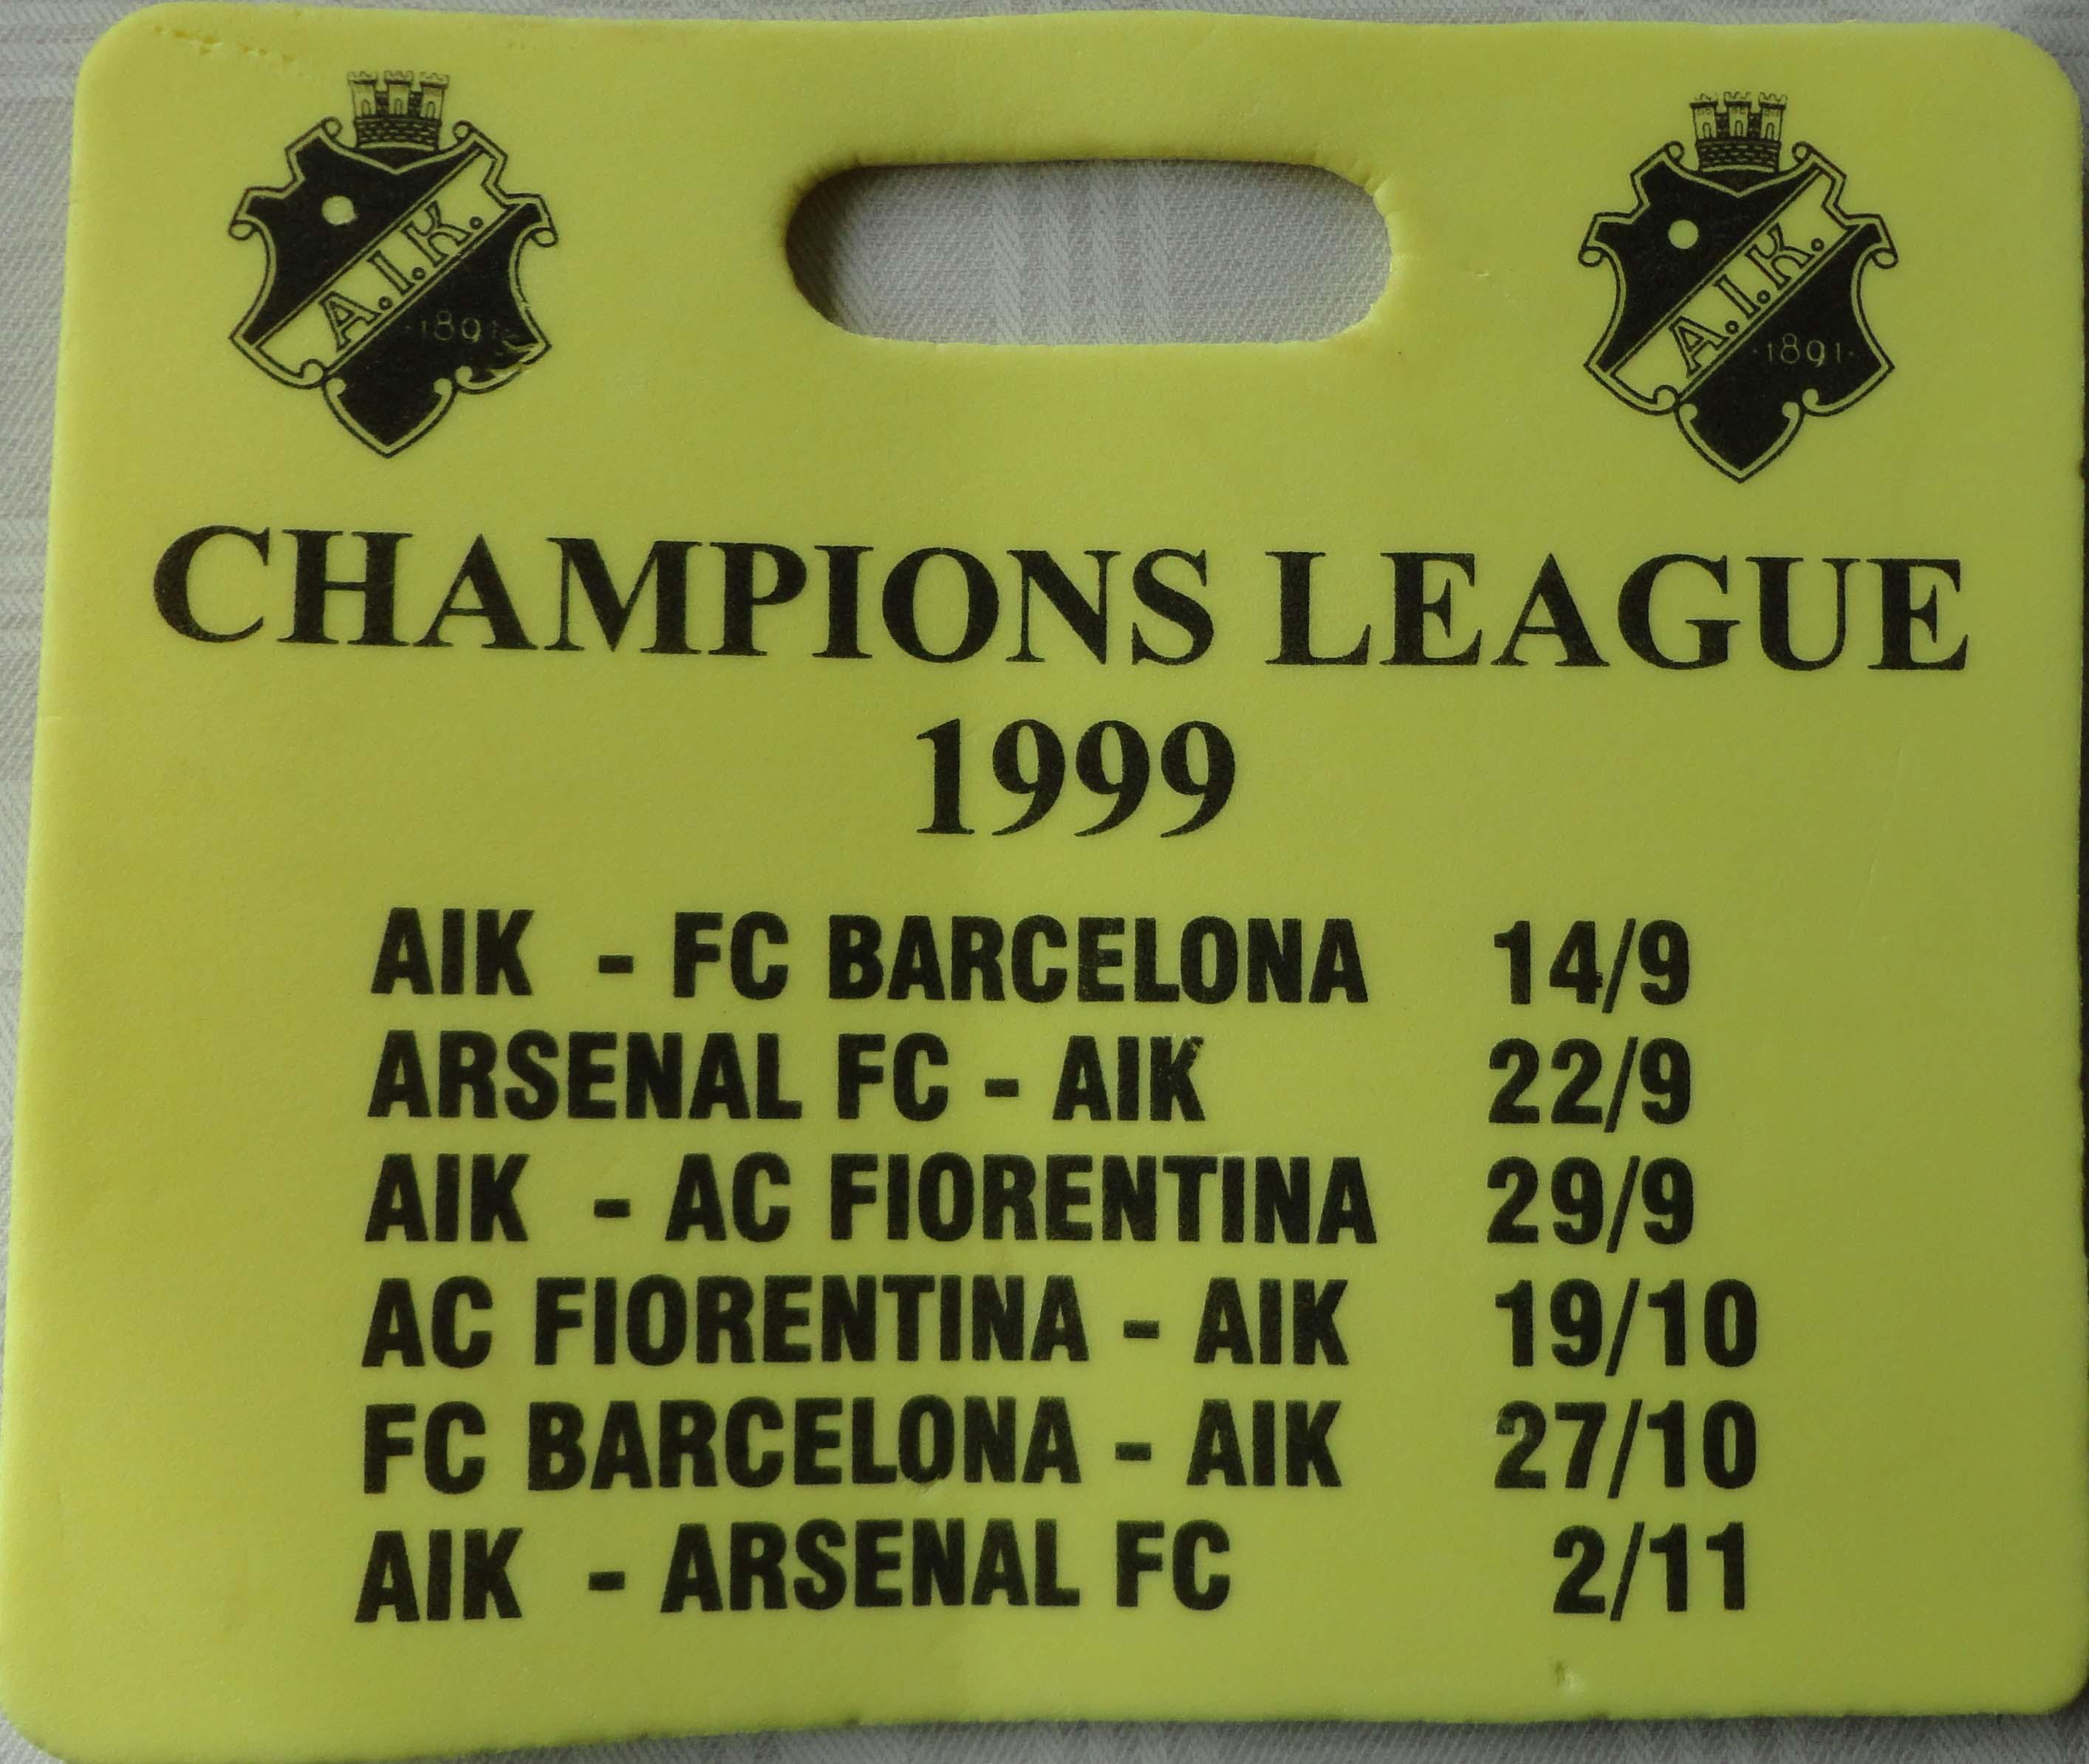 A.I.K. i Championsleague1999